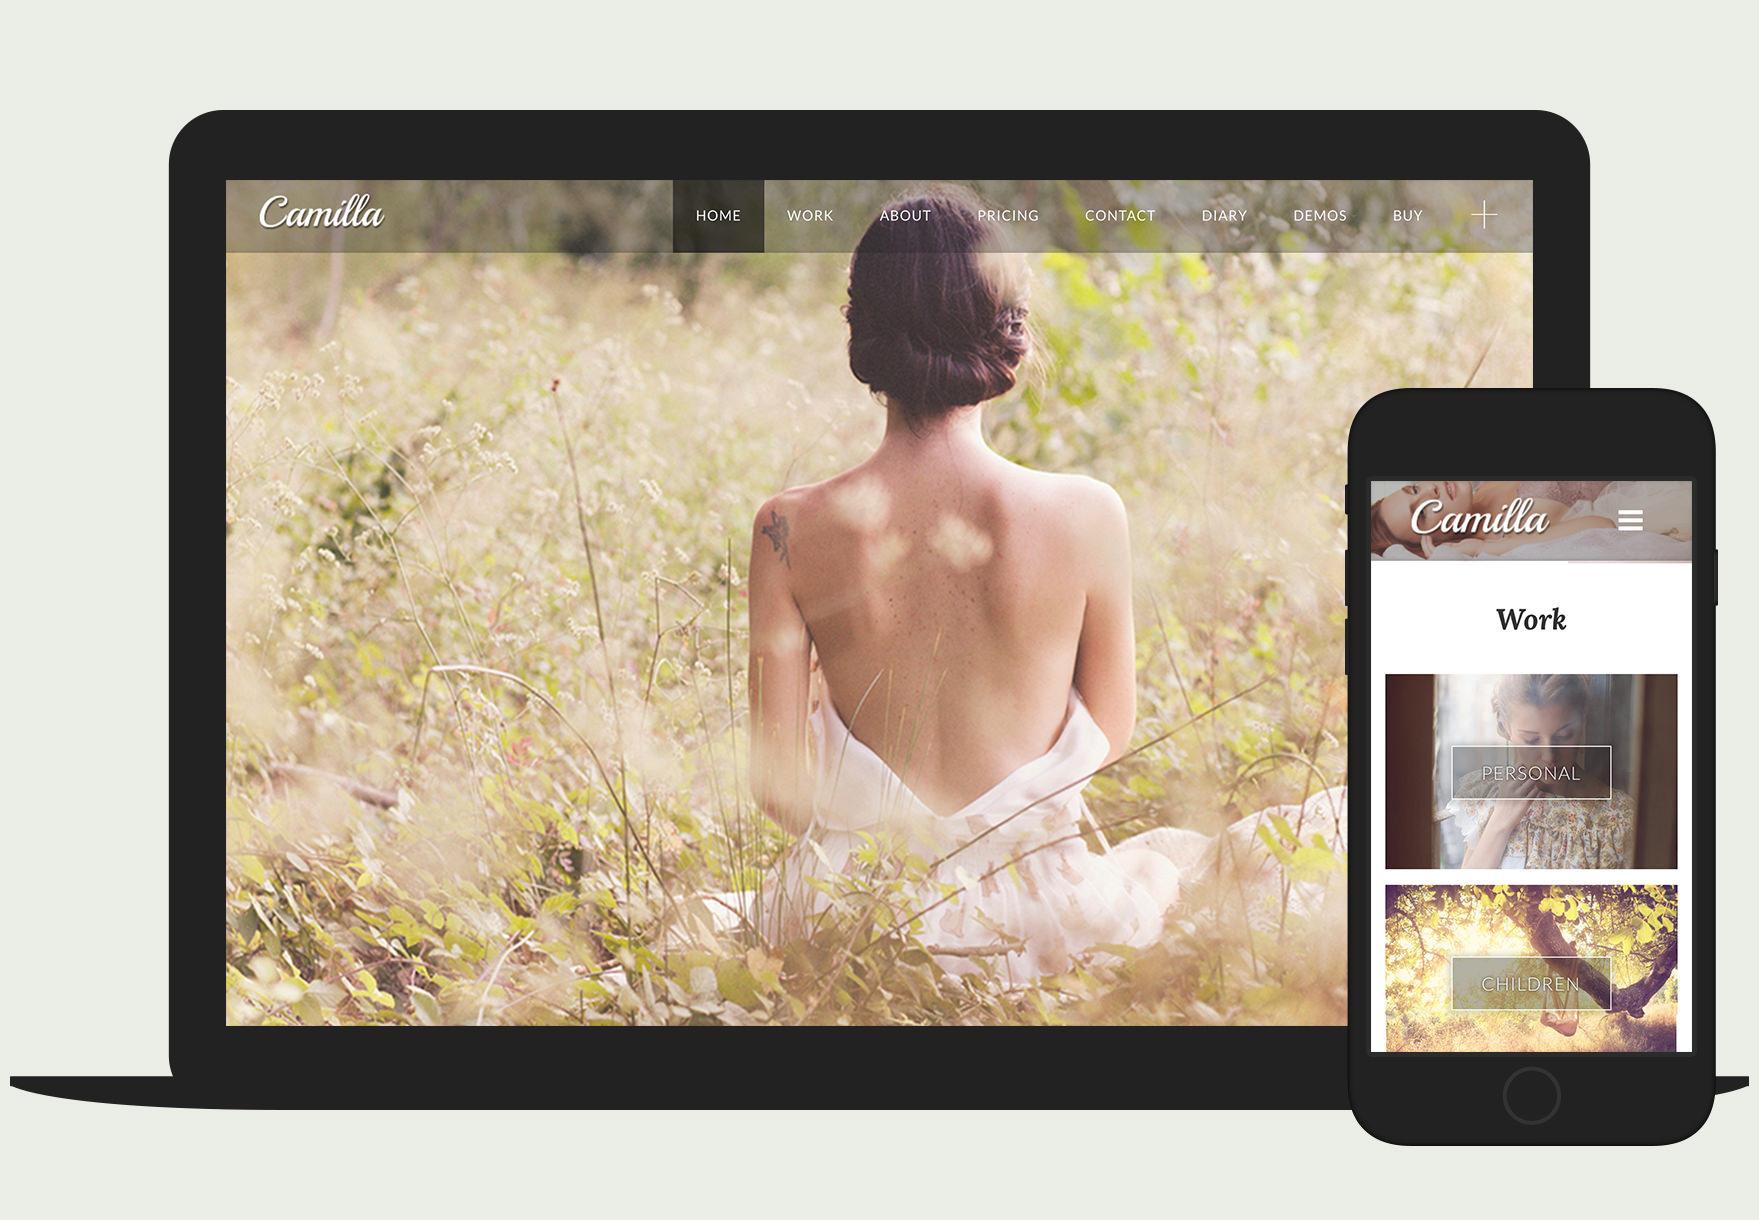 Camilla - Responsive full-screen horizontal photography WordPress theme